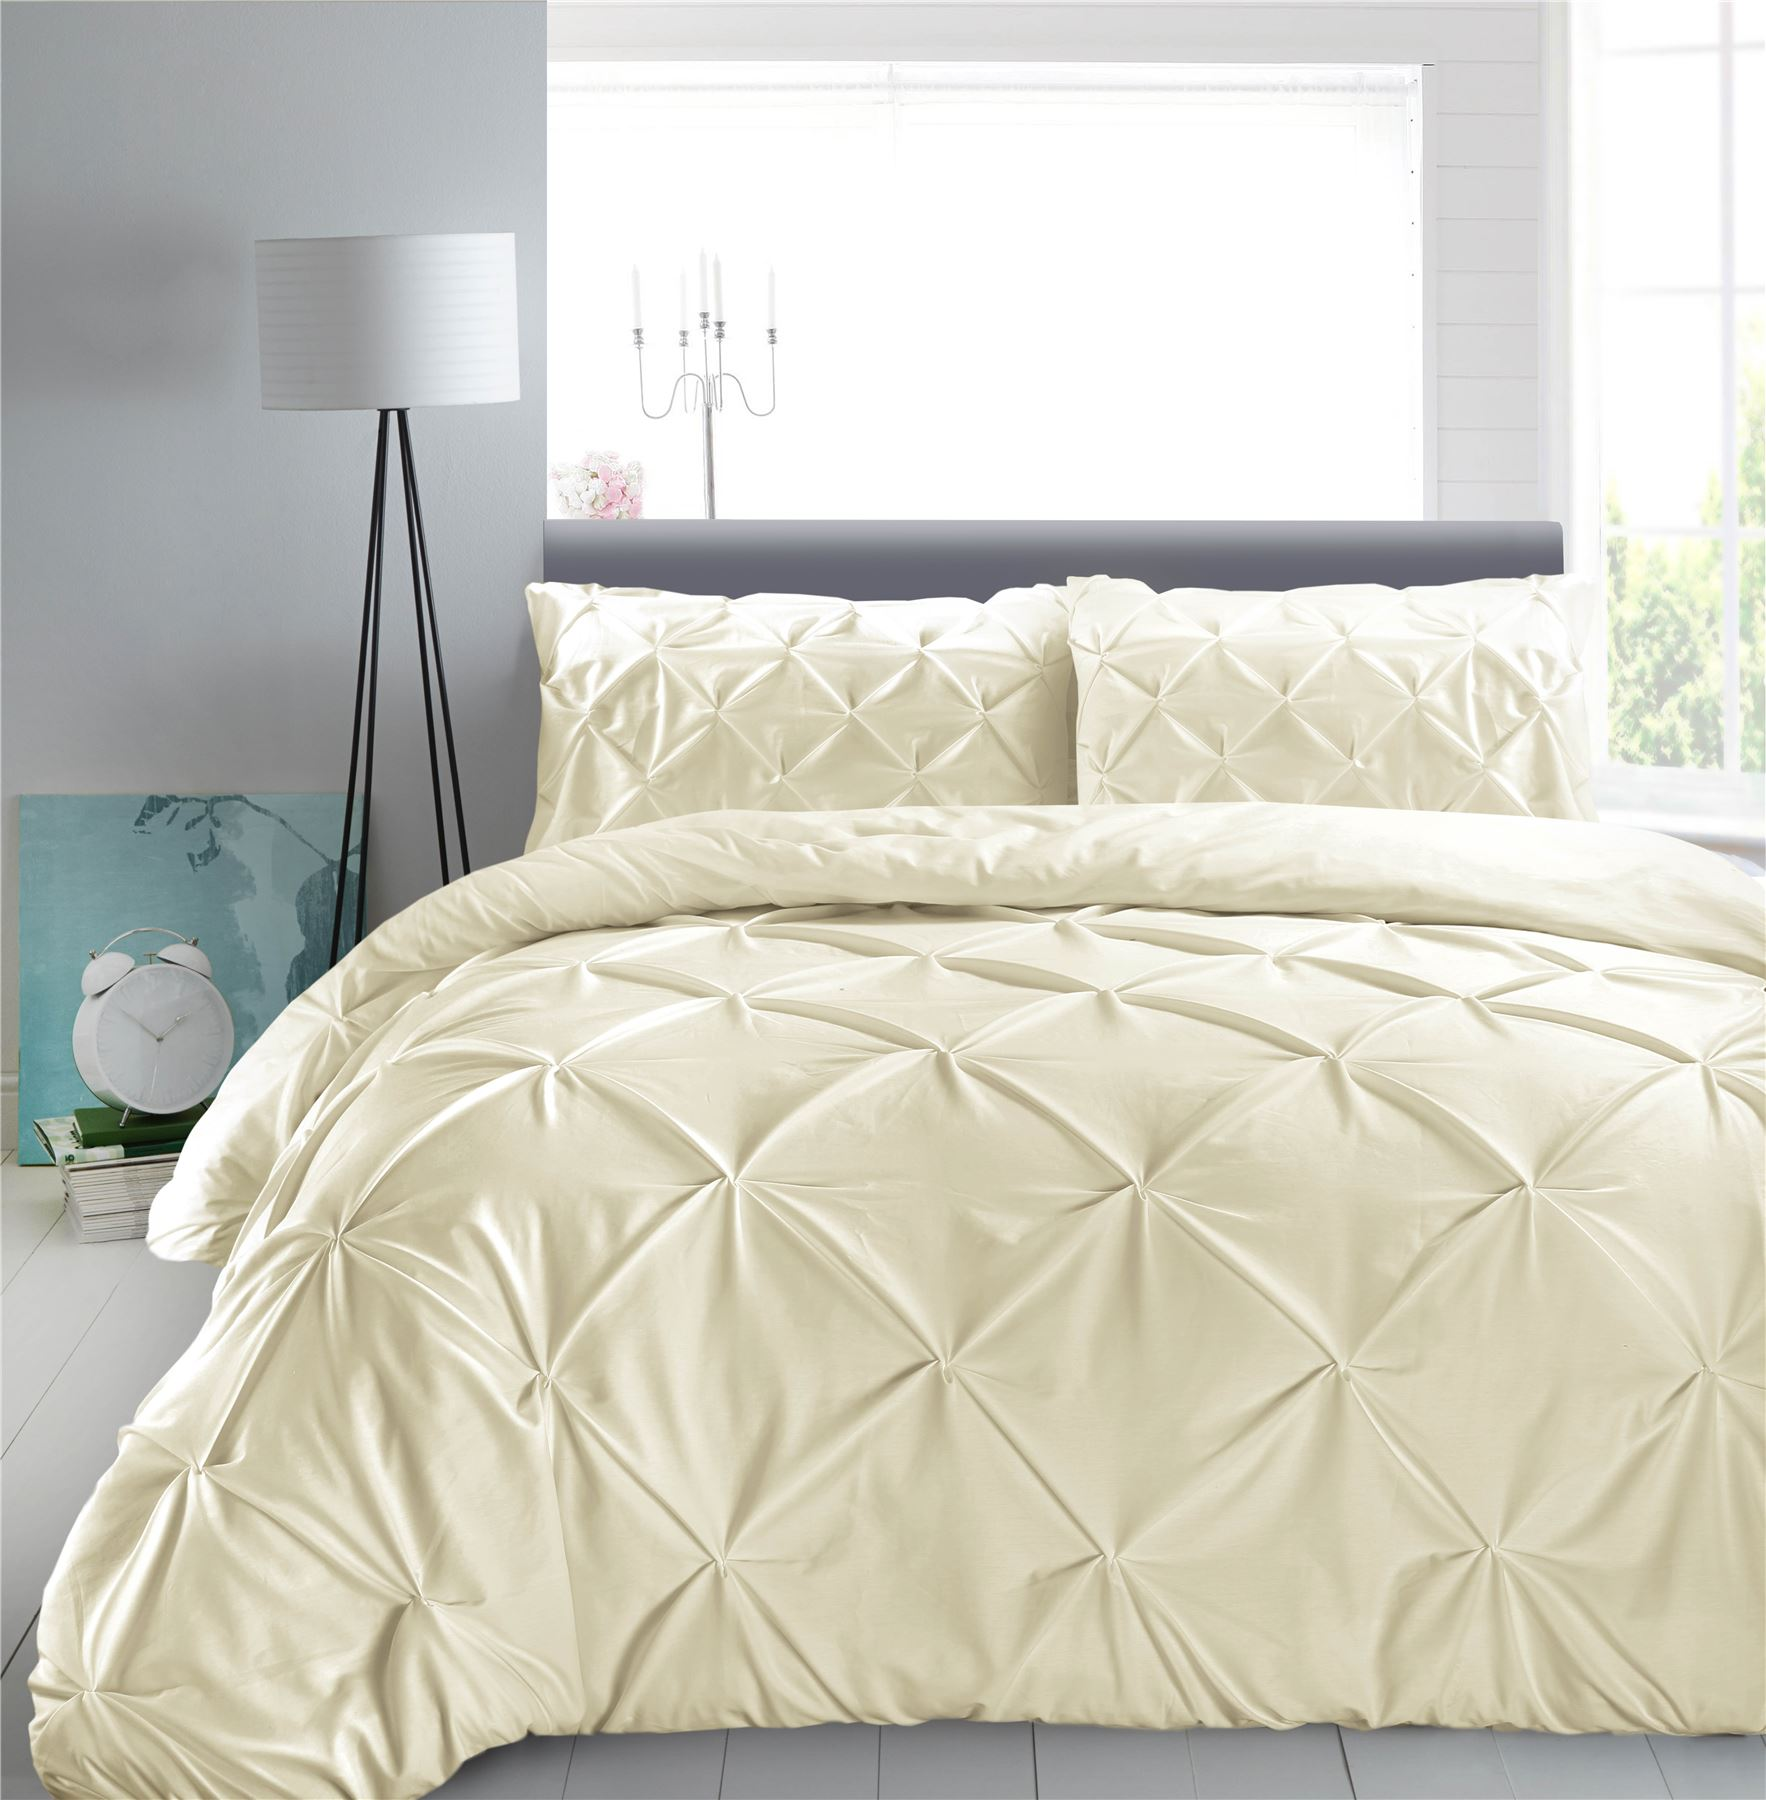 Luxury-Pure-100-Cotton-200-Thread-Pinch-Pleat-Pintuck-Puckering-Duvet-Cover-Set thumbnail 12